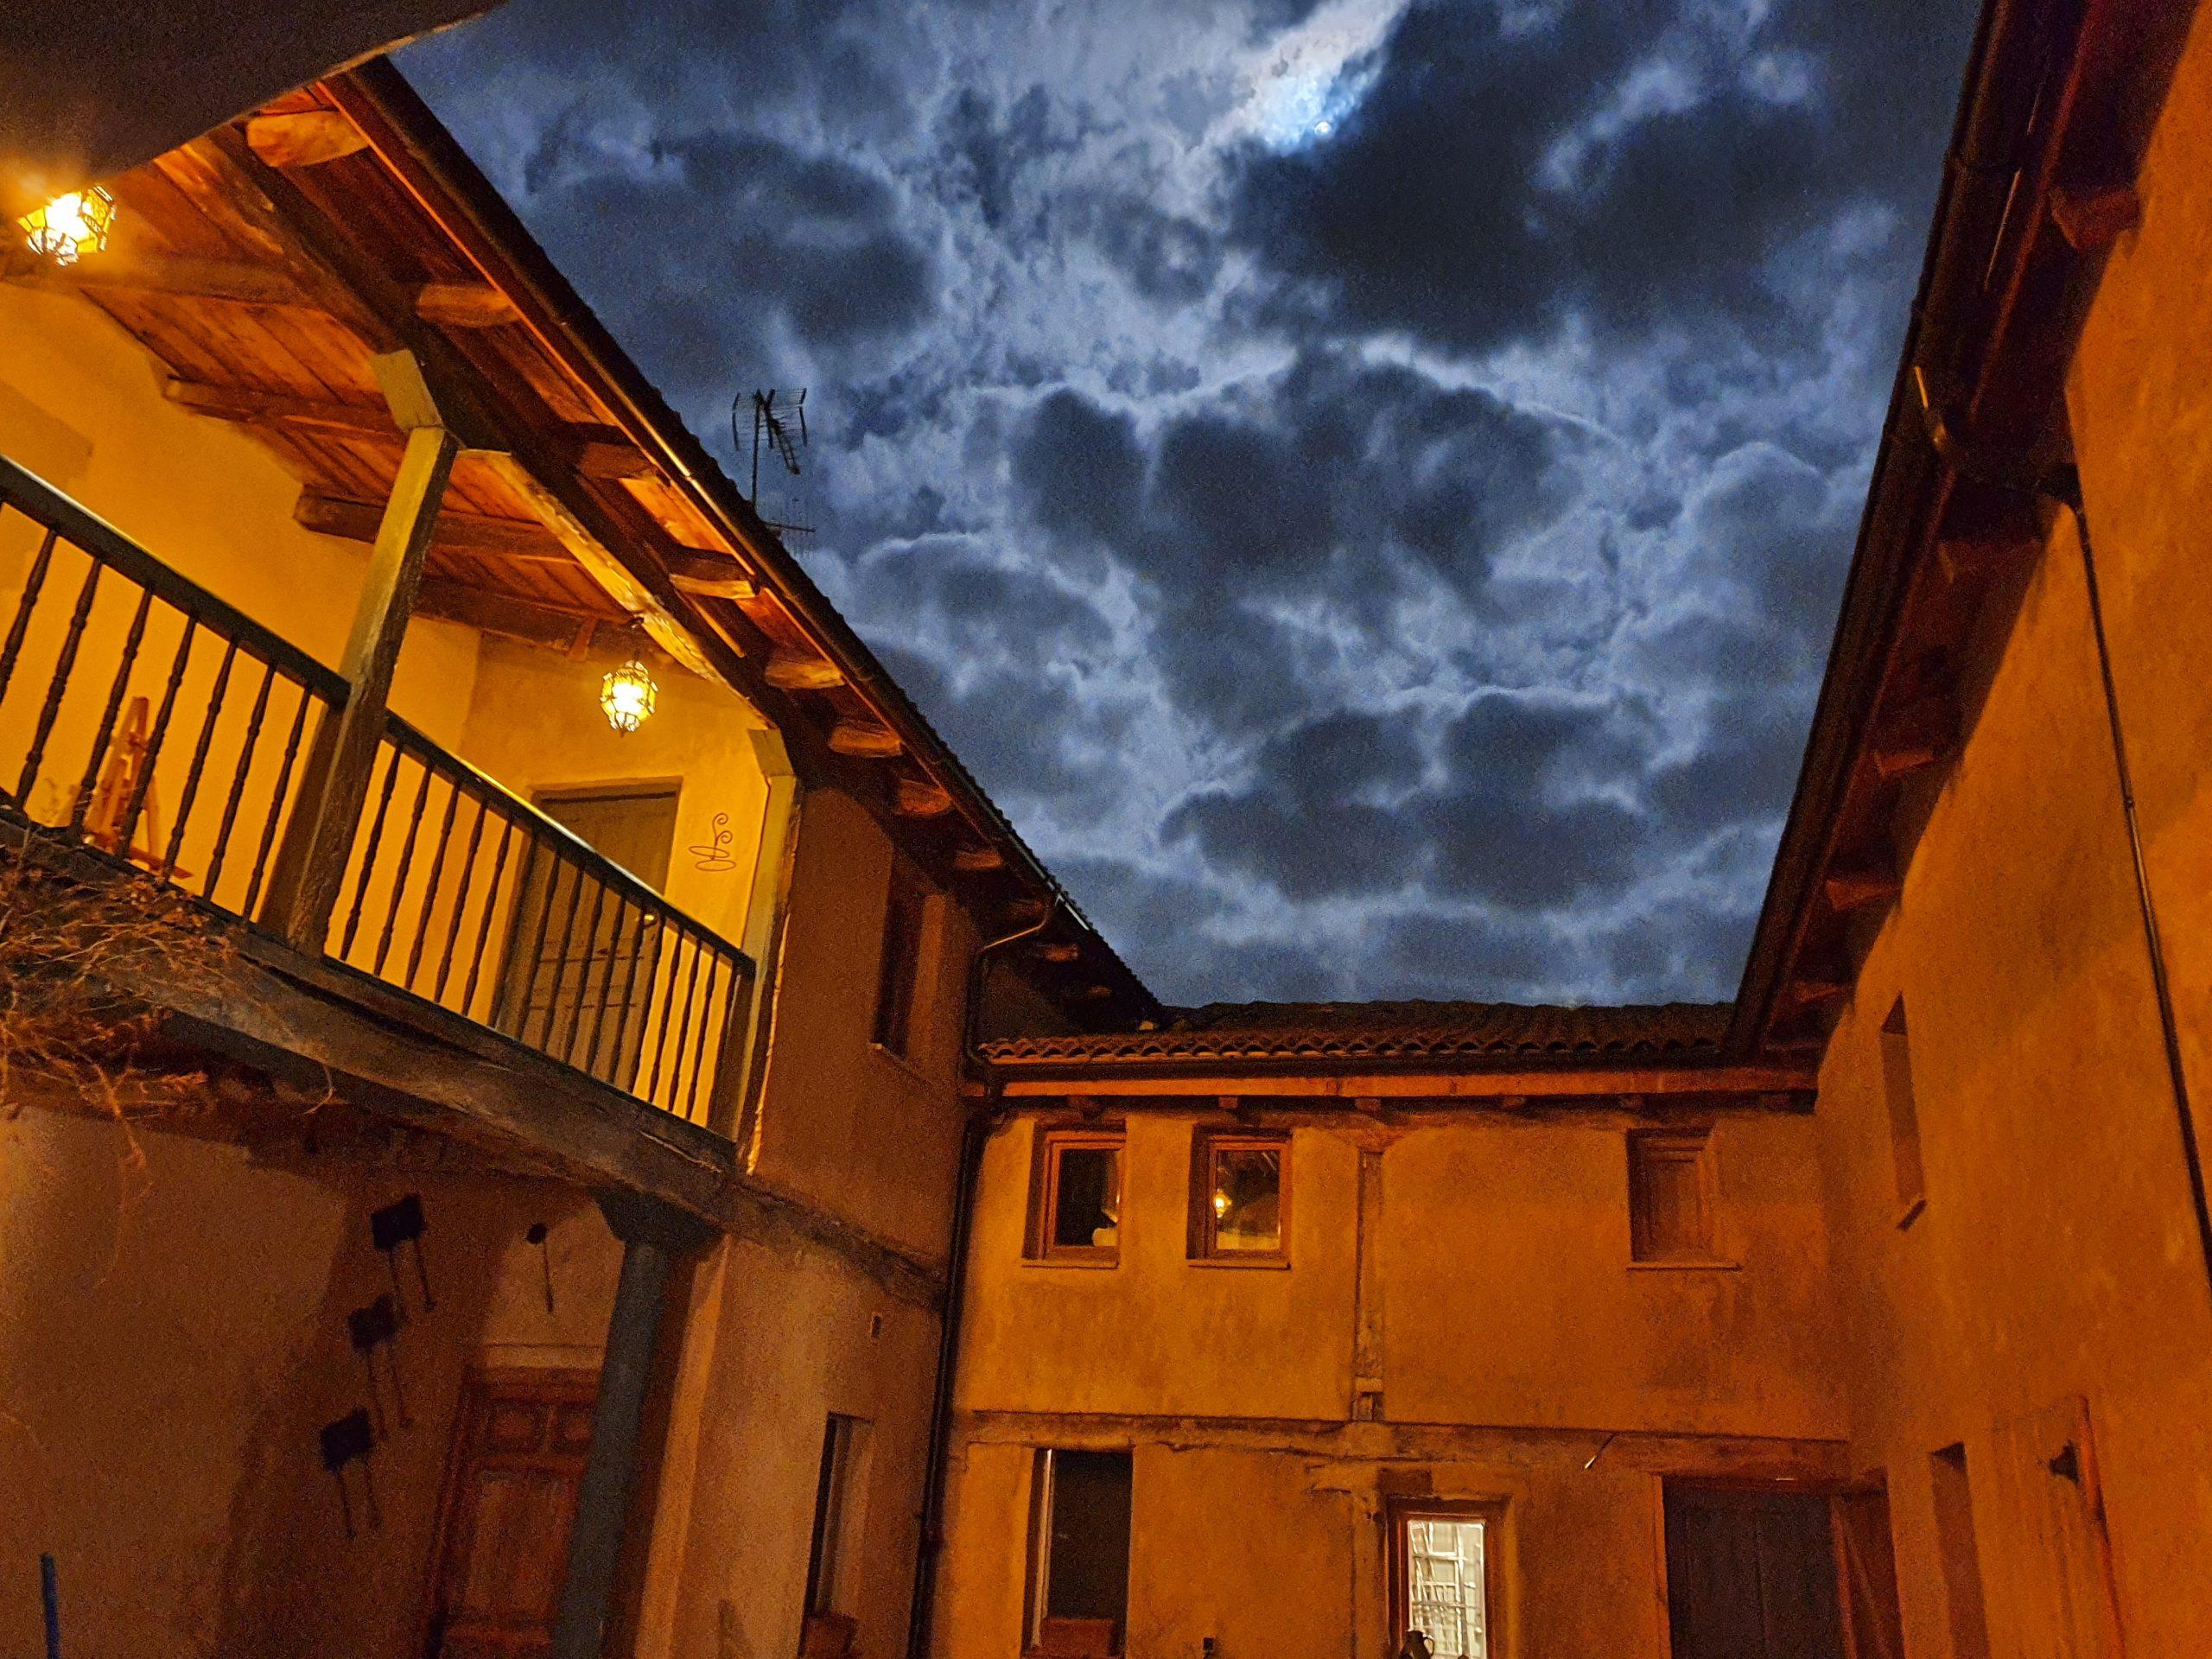 Patio by night